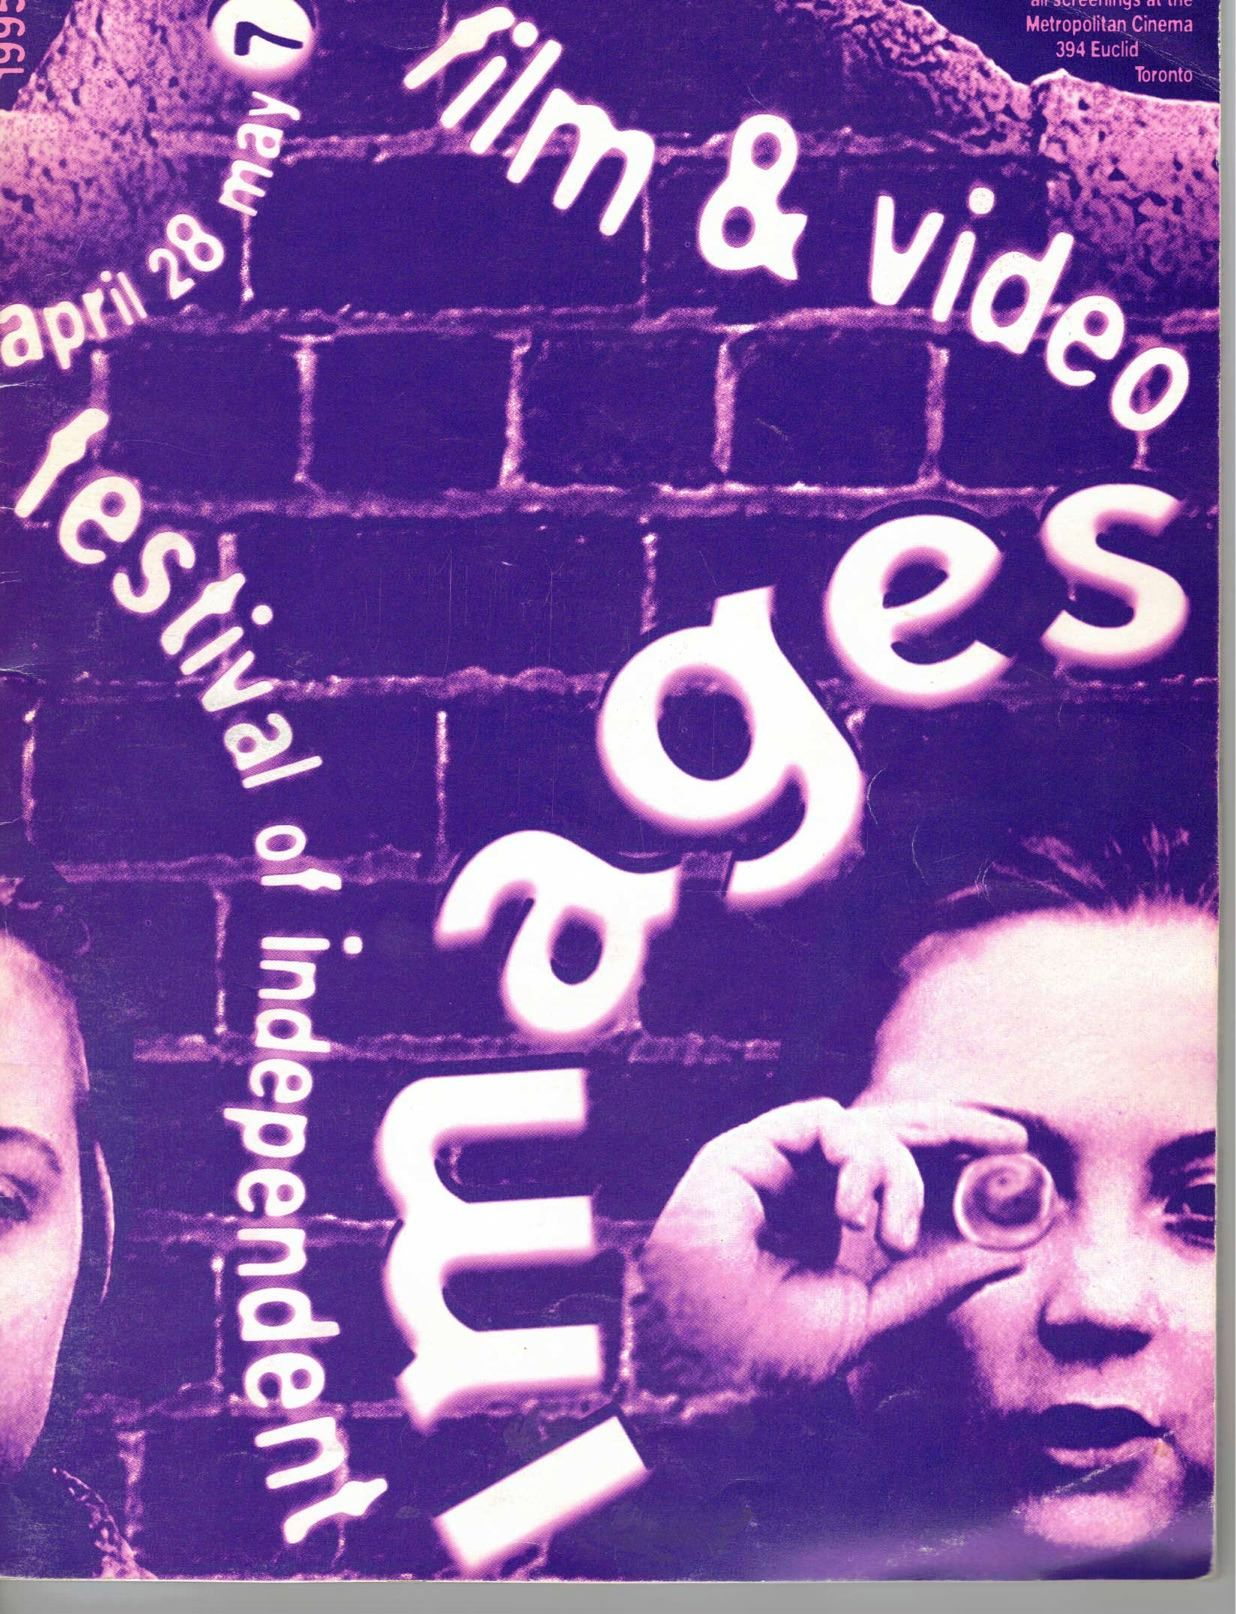 Images Festival Archive (1995)